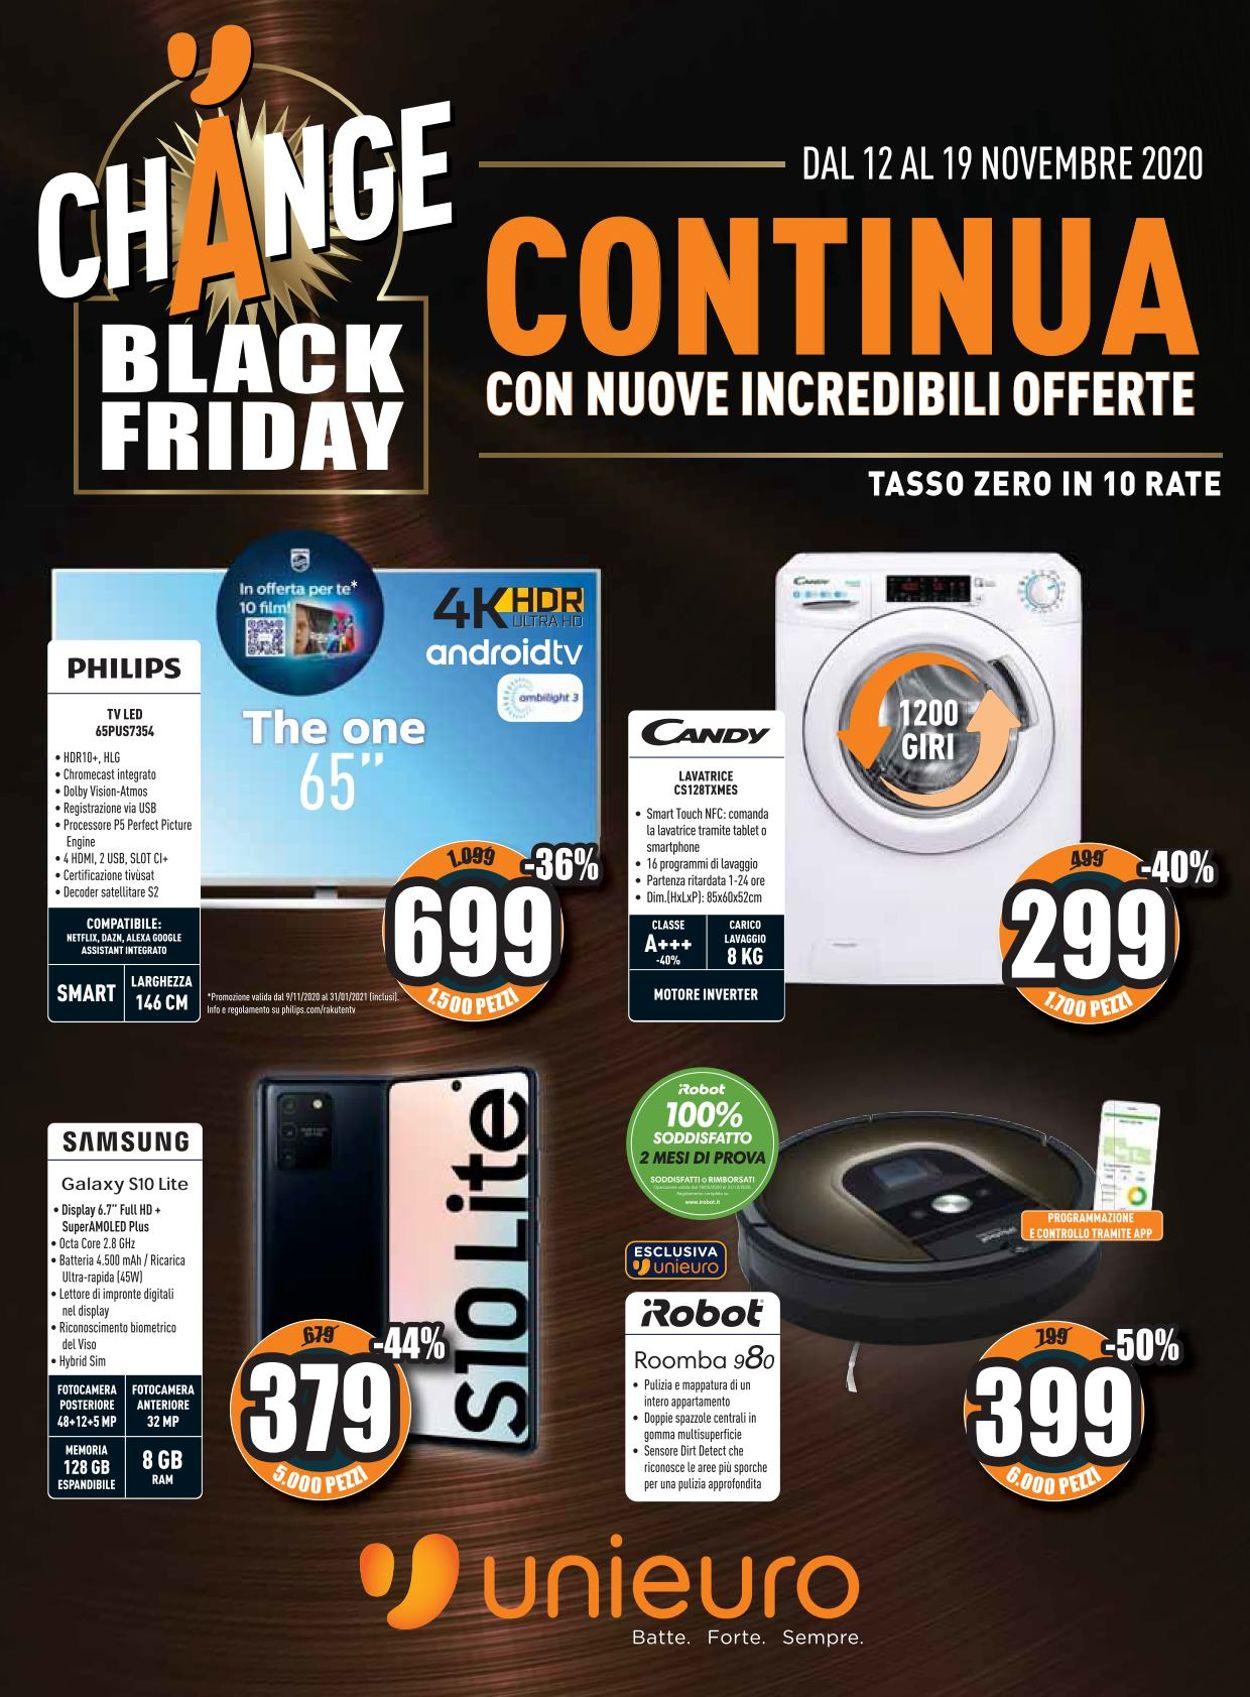 Volantino Unieuro - Black Friday 2020 - Offerte 12/11-19/11/2020